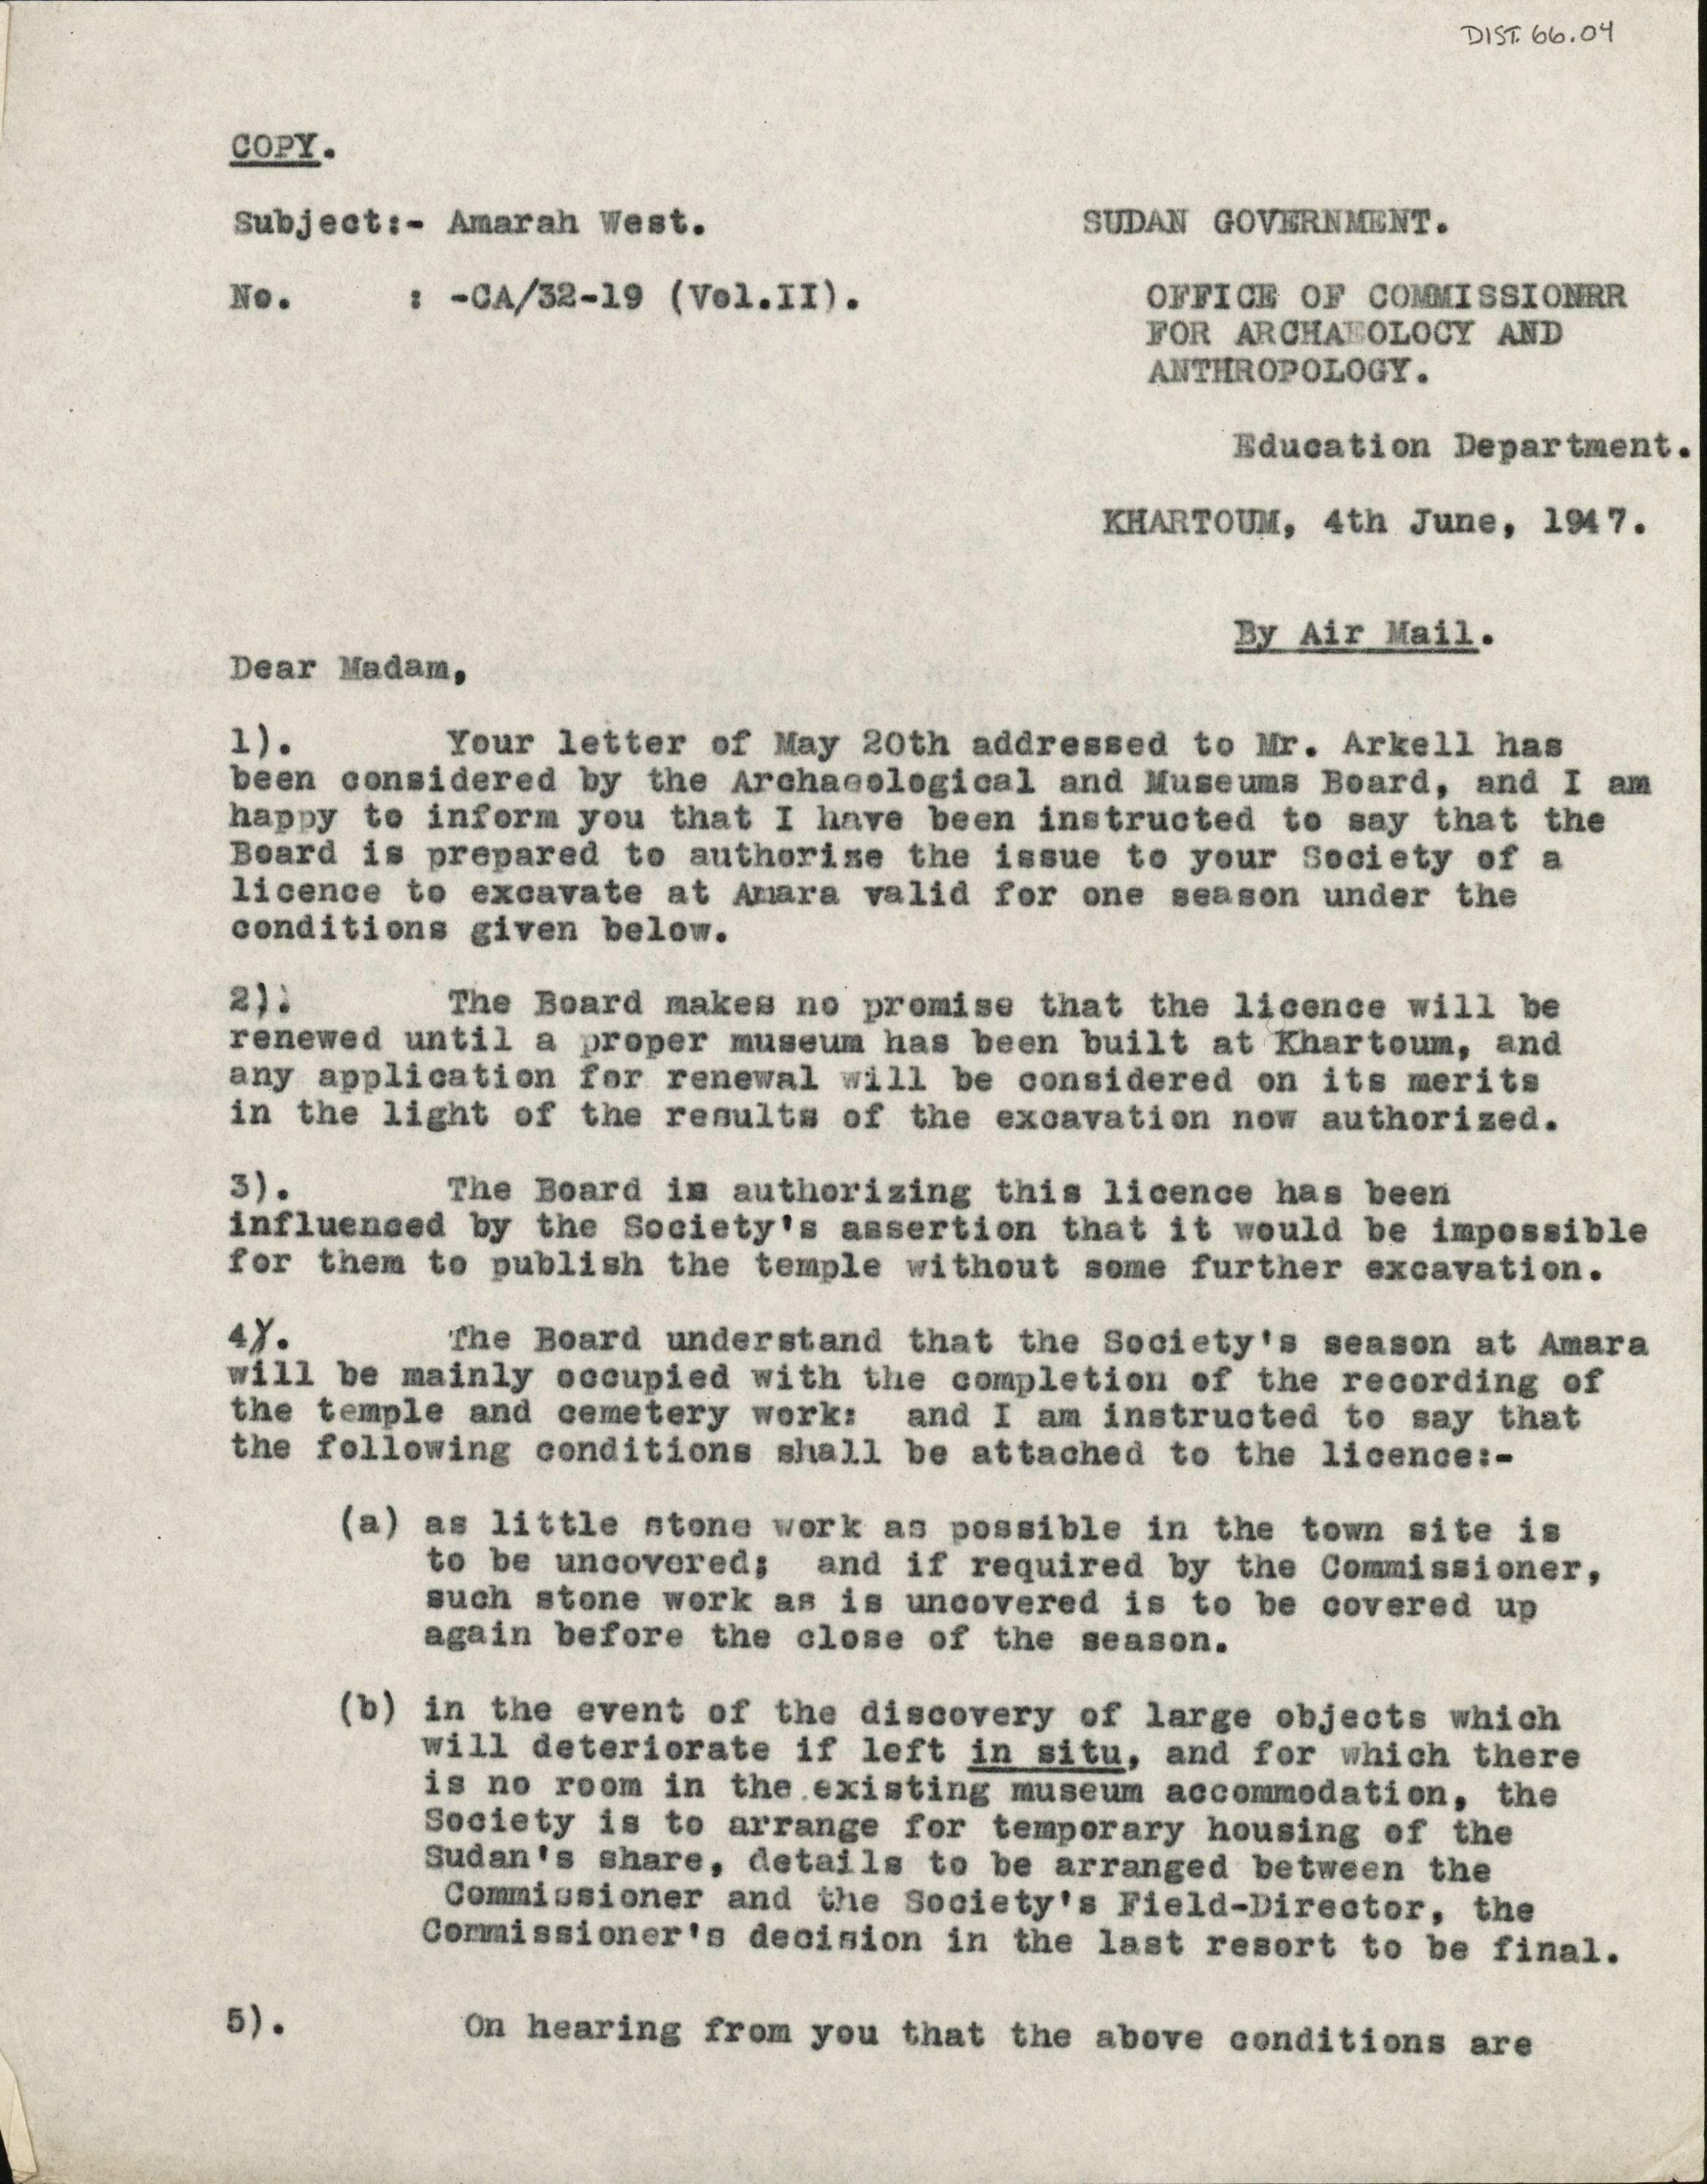 1947-54 Amarah West DIST.66.04a